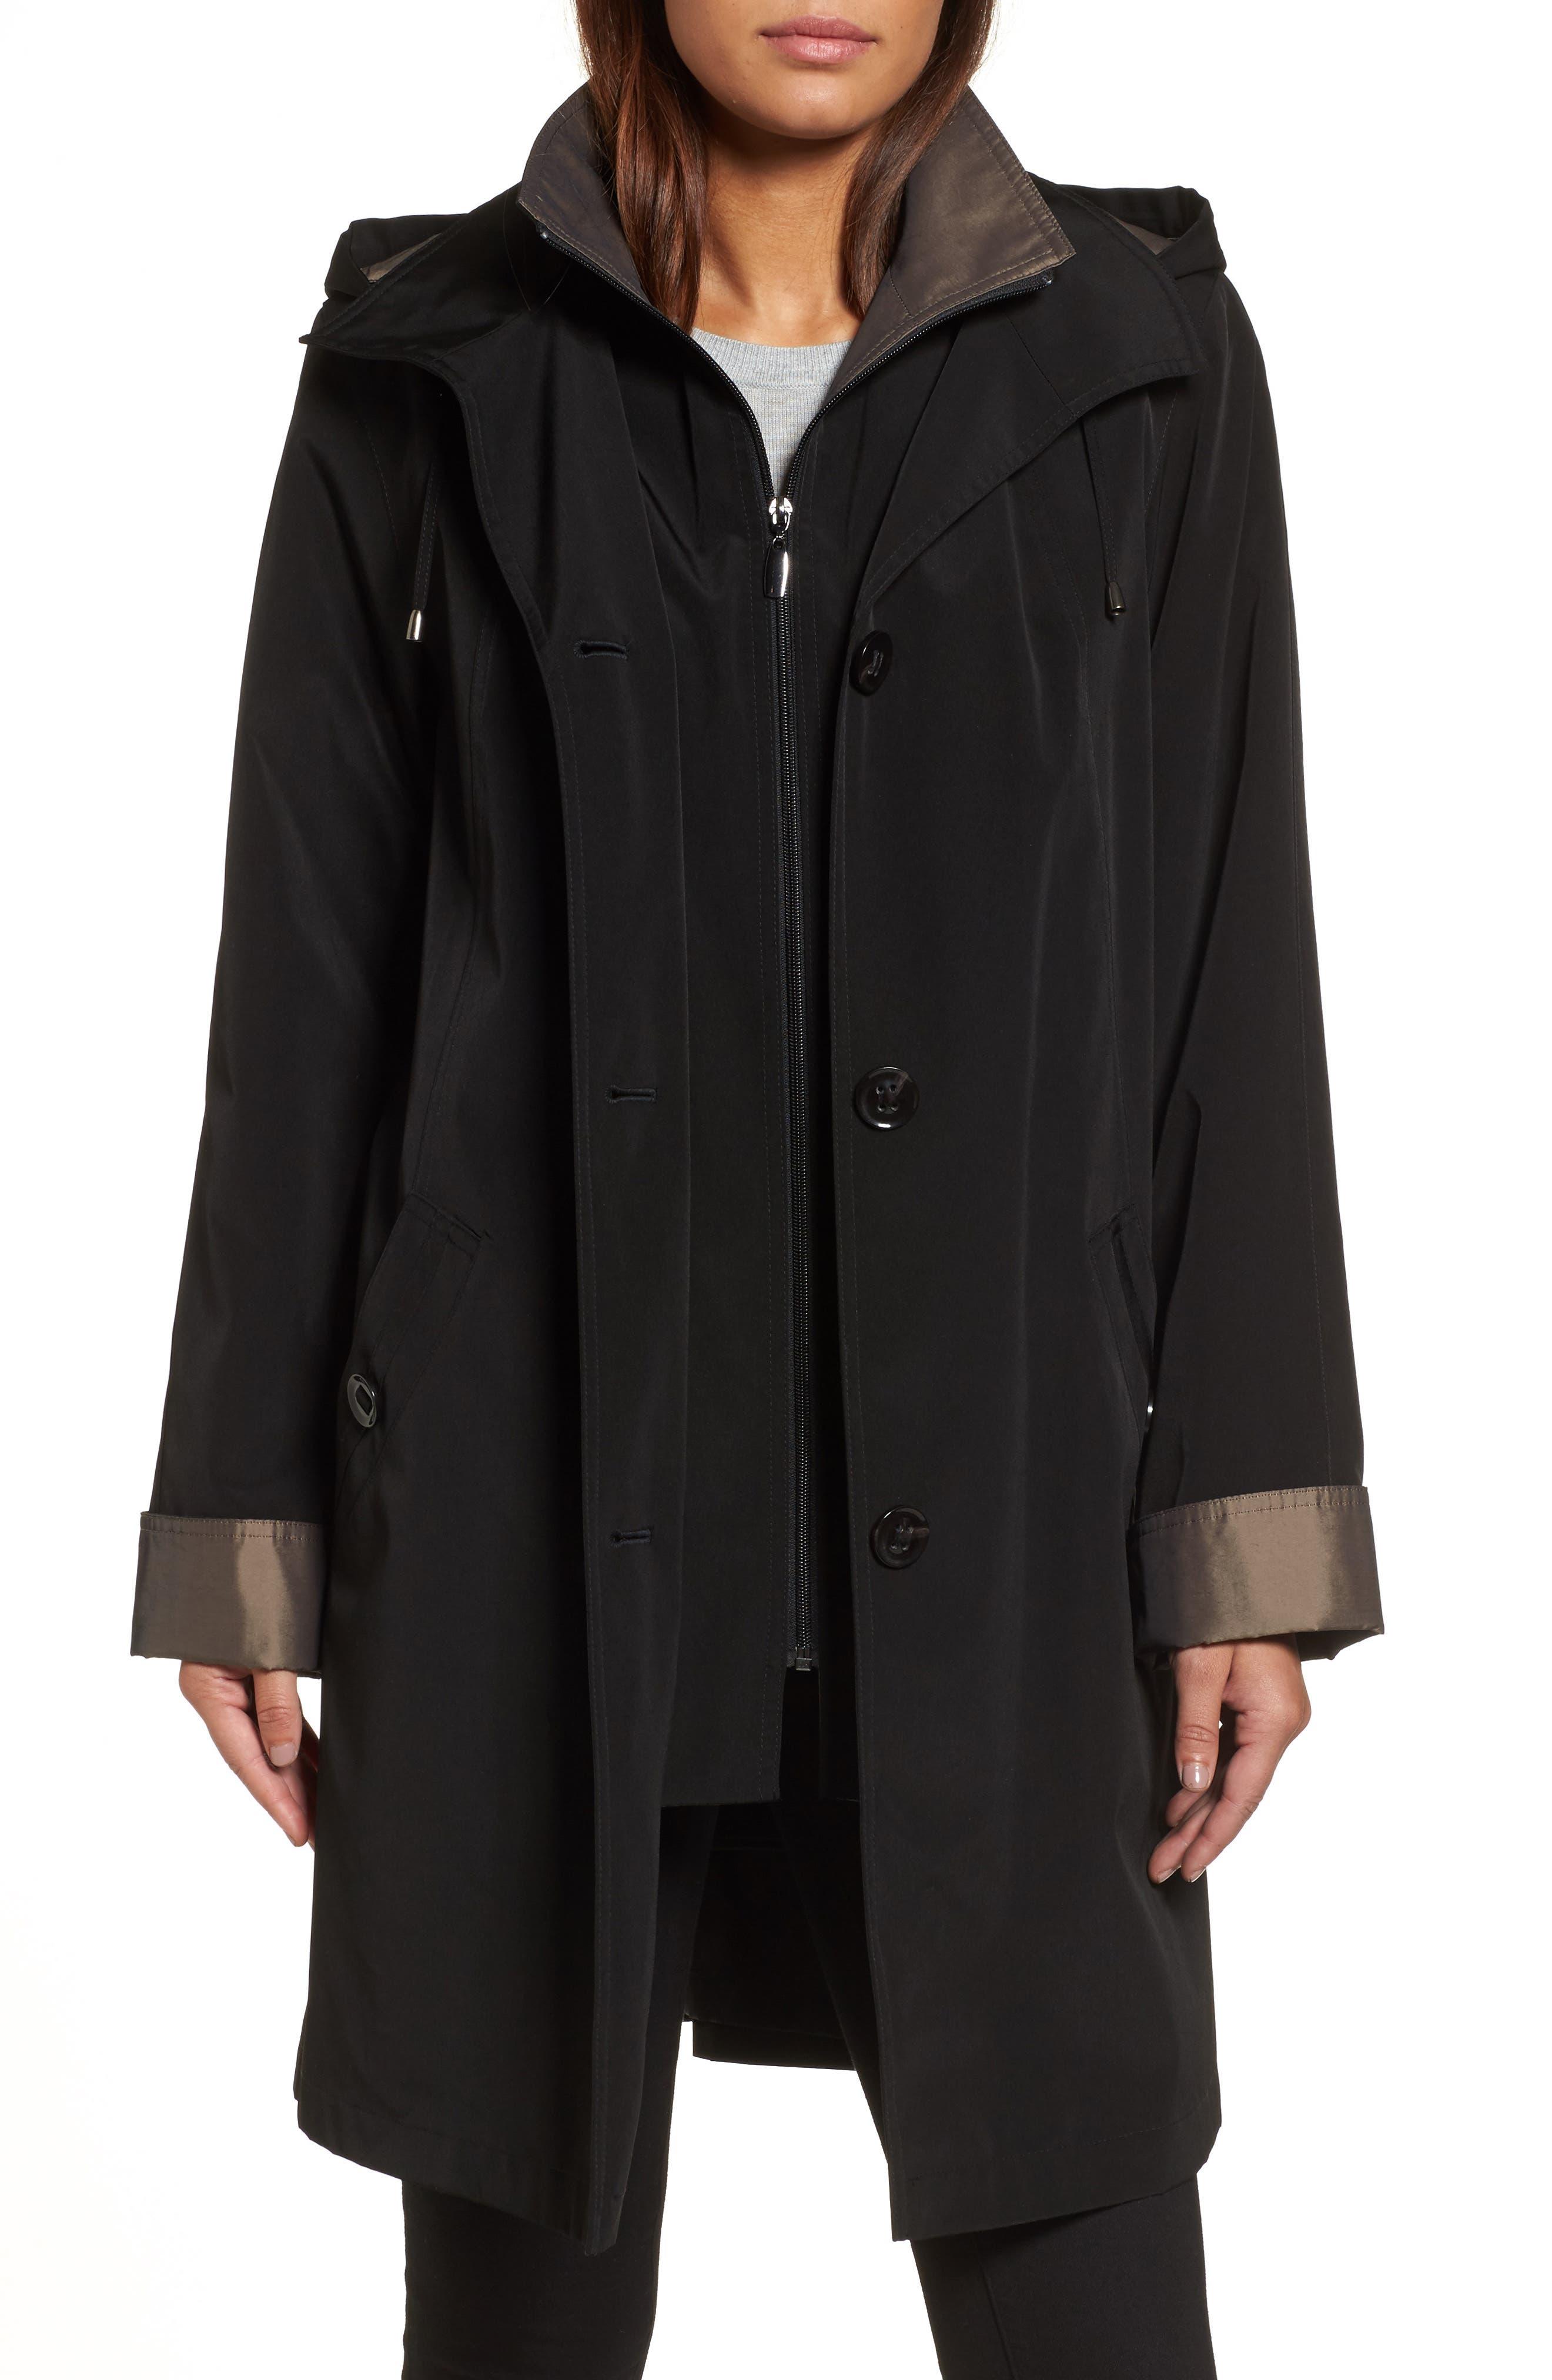 women's rain coats & jackets   nordstrom